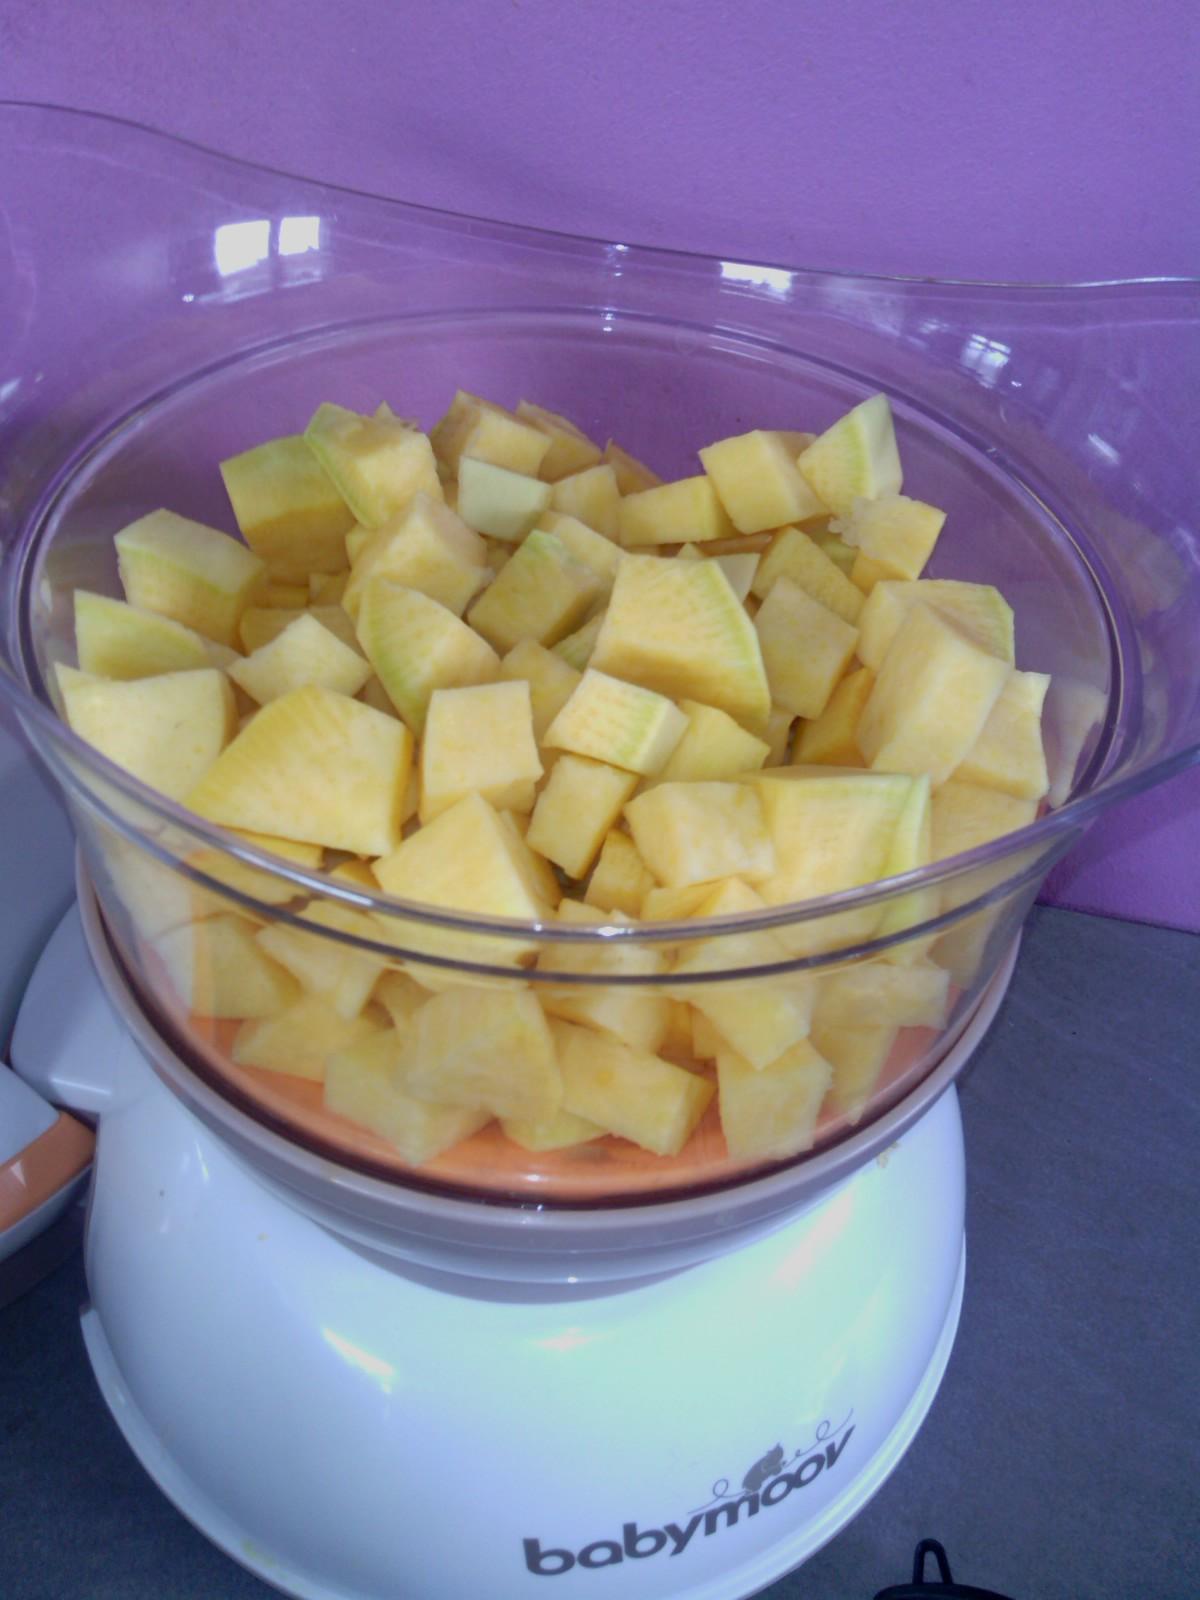 Rutabaga avant cuisson